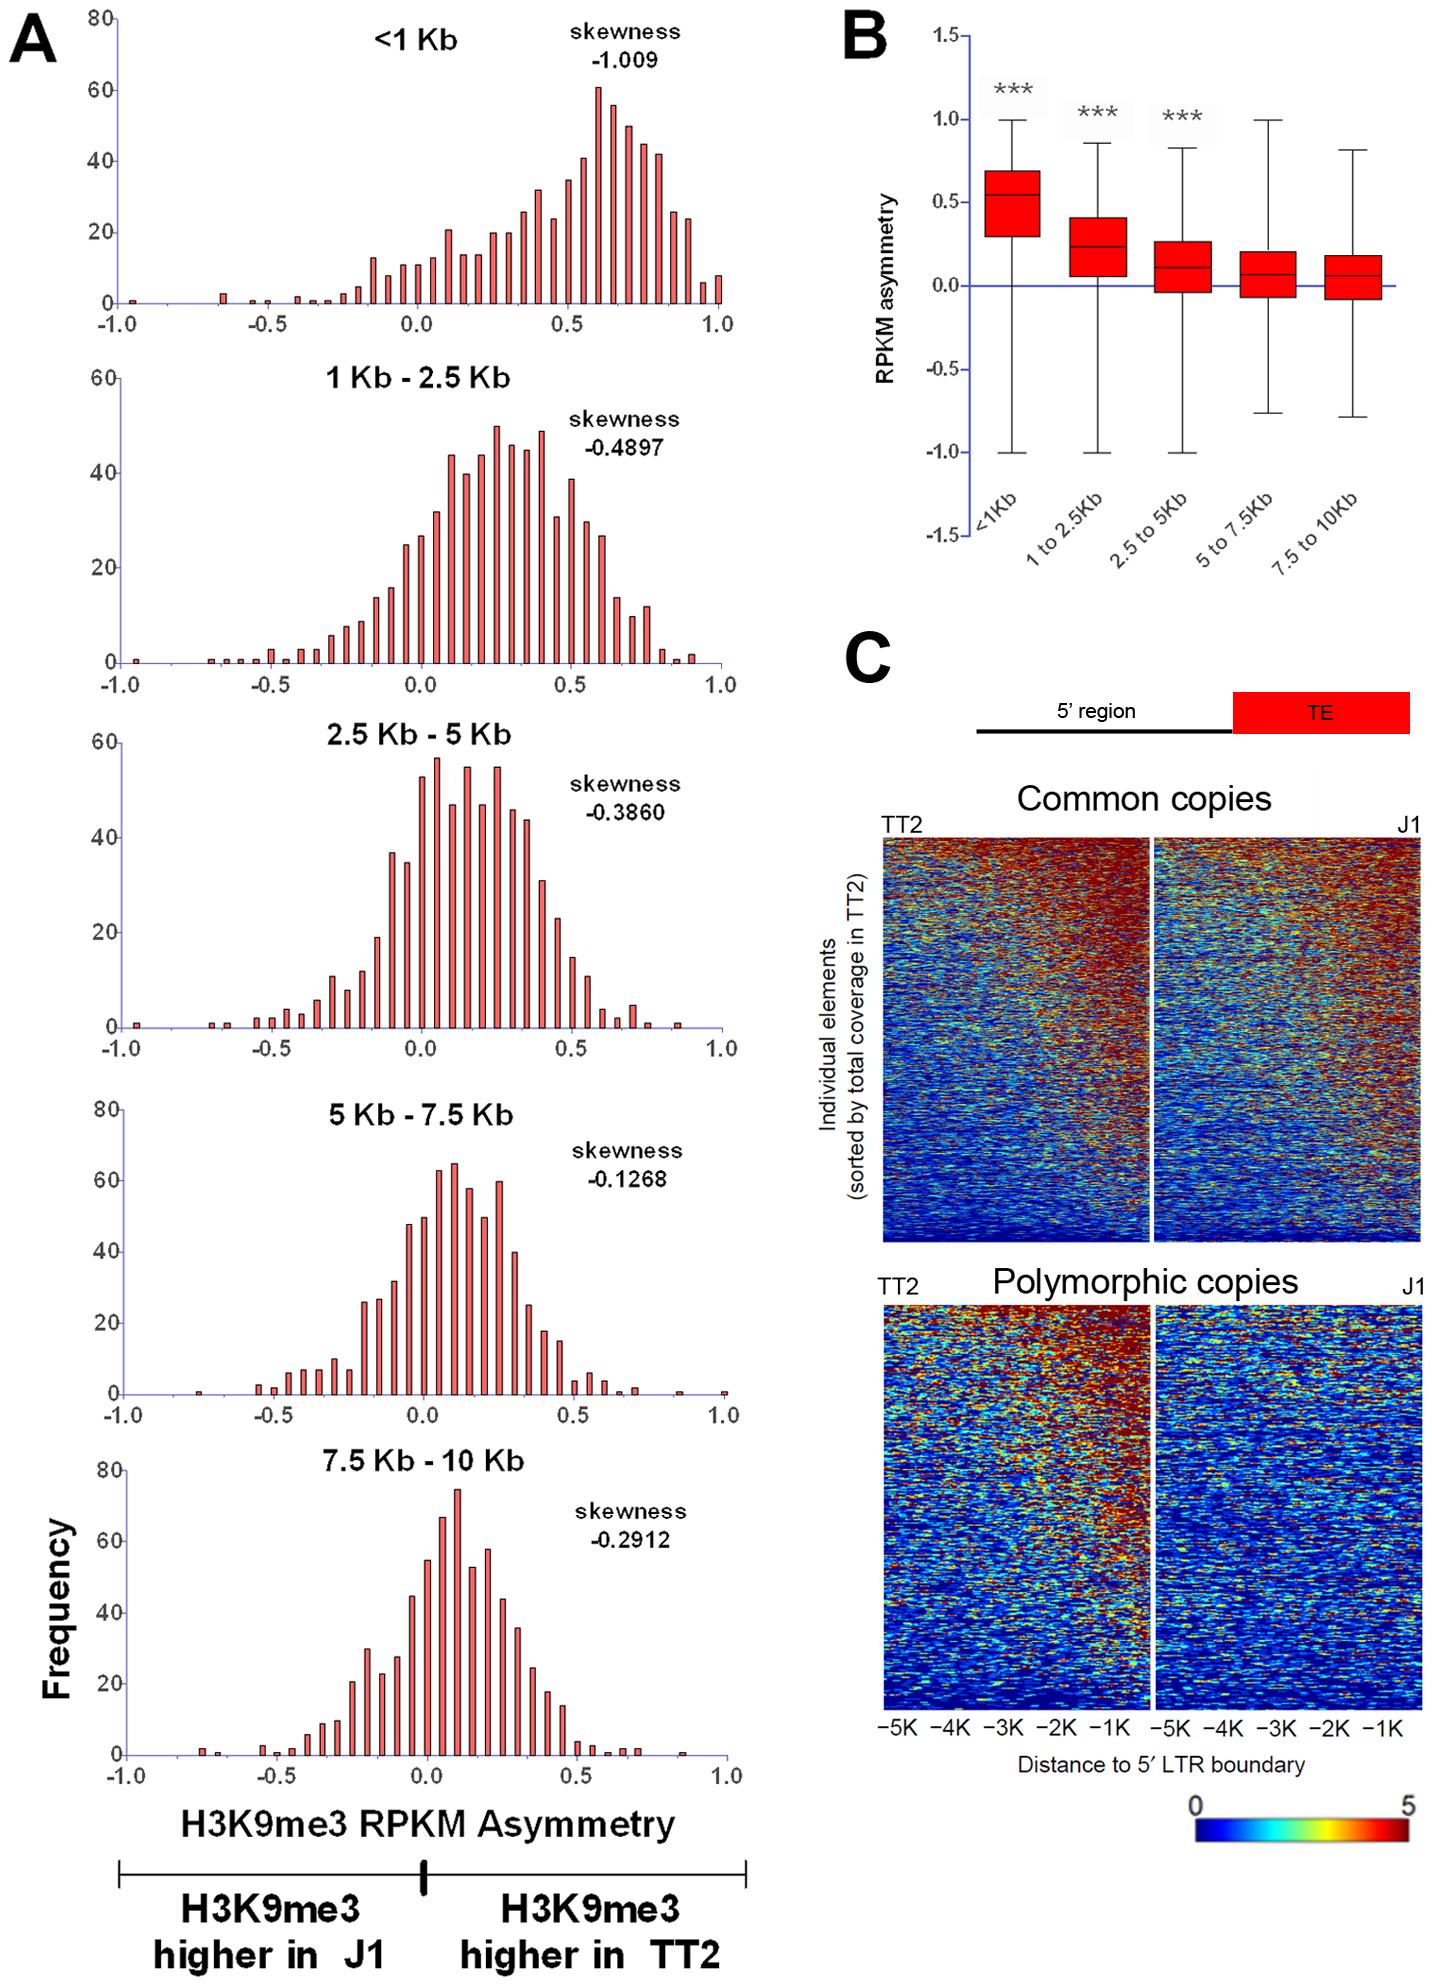 Length of polymorphic IAP-induced H3K9me3 chromatin.